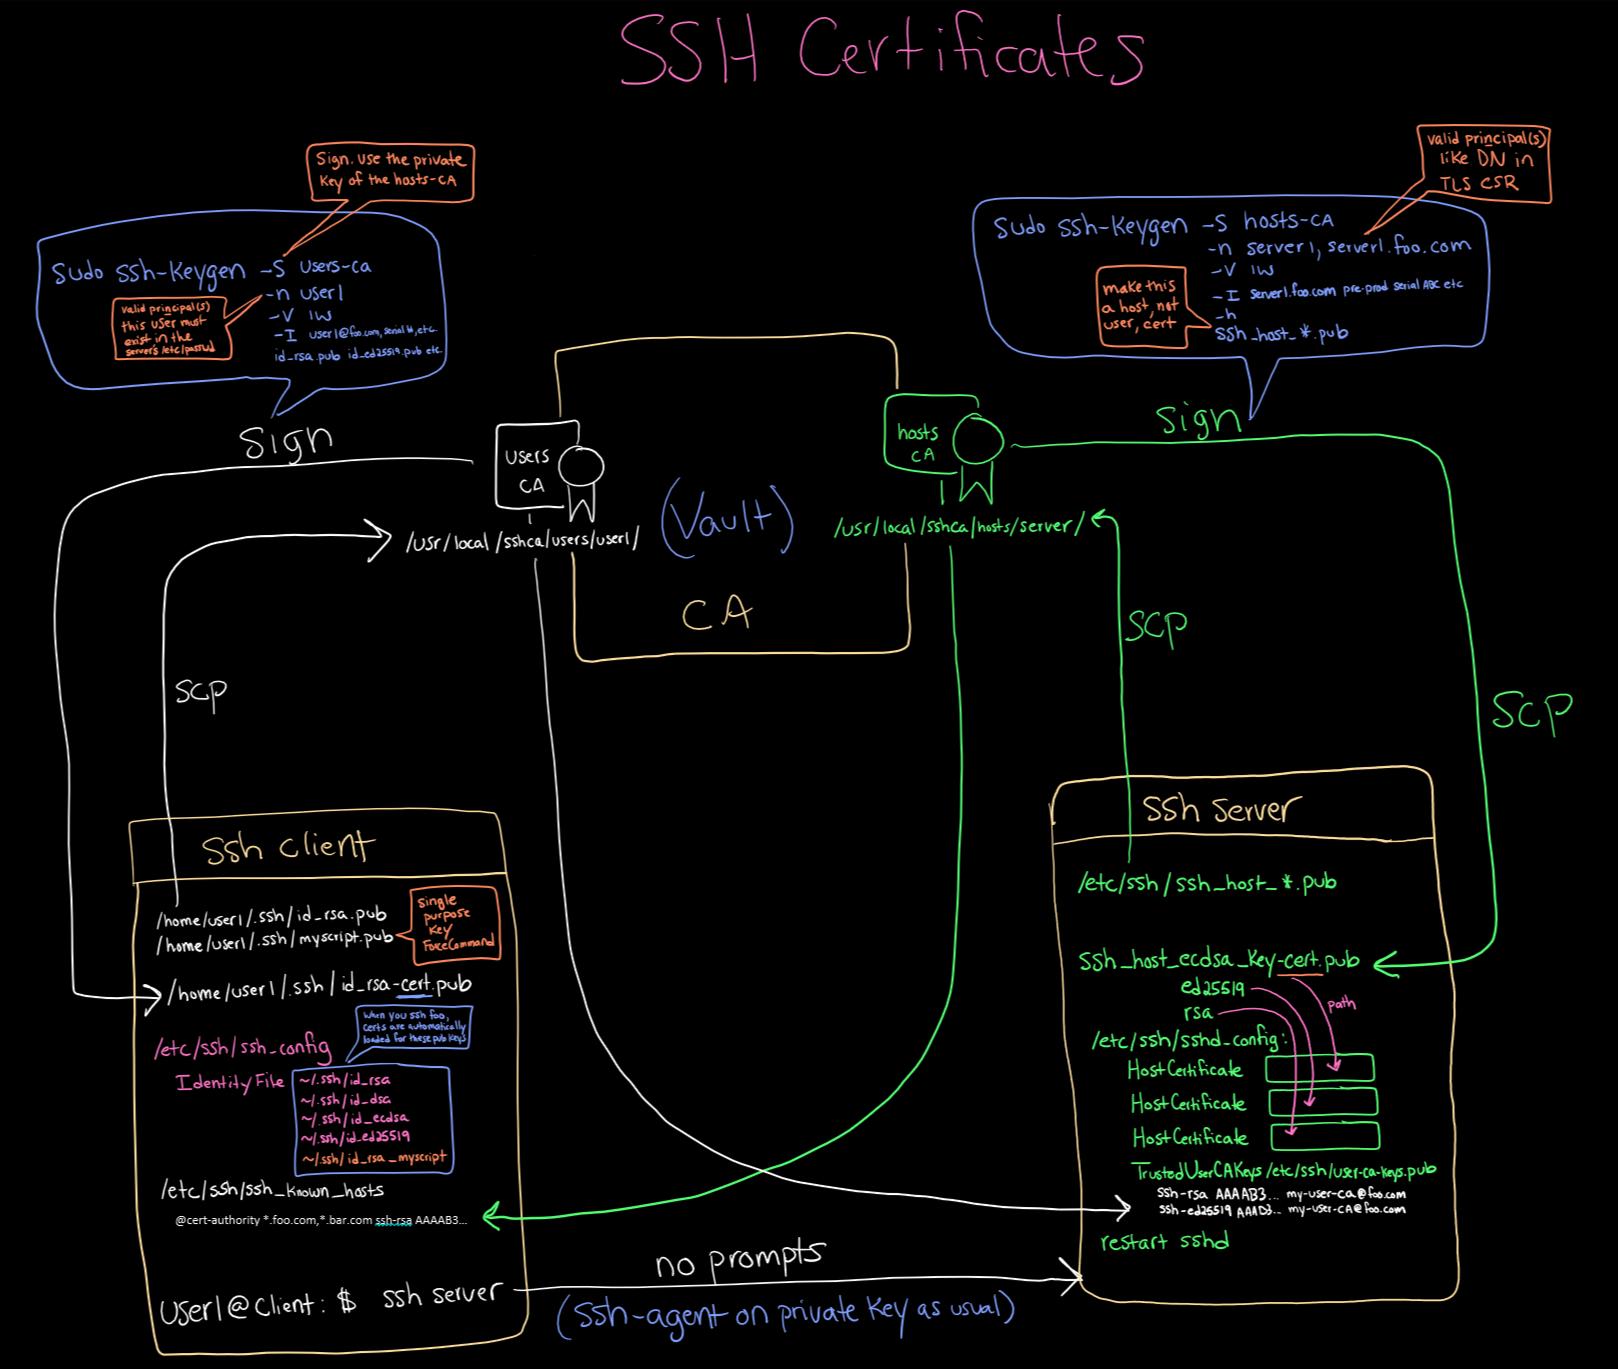 ssh certificates